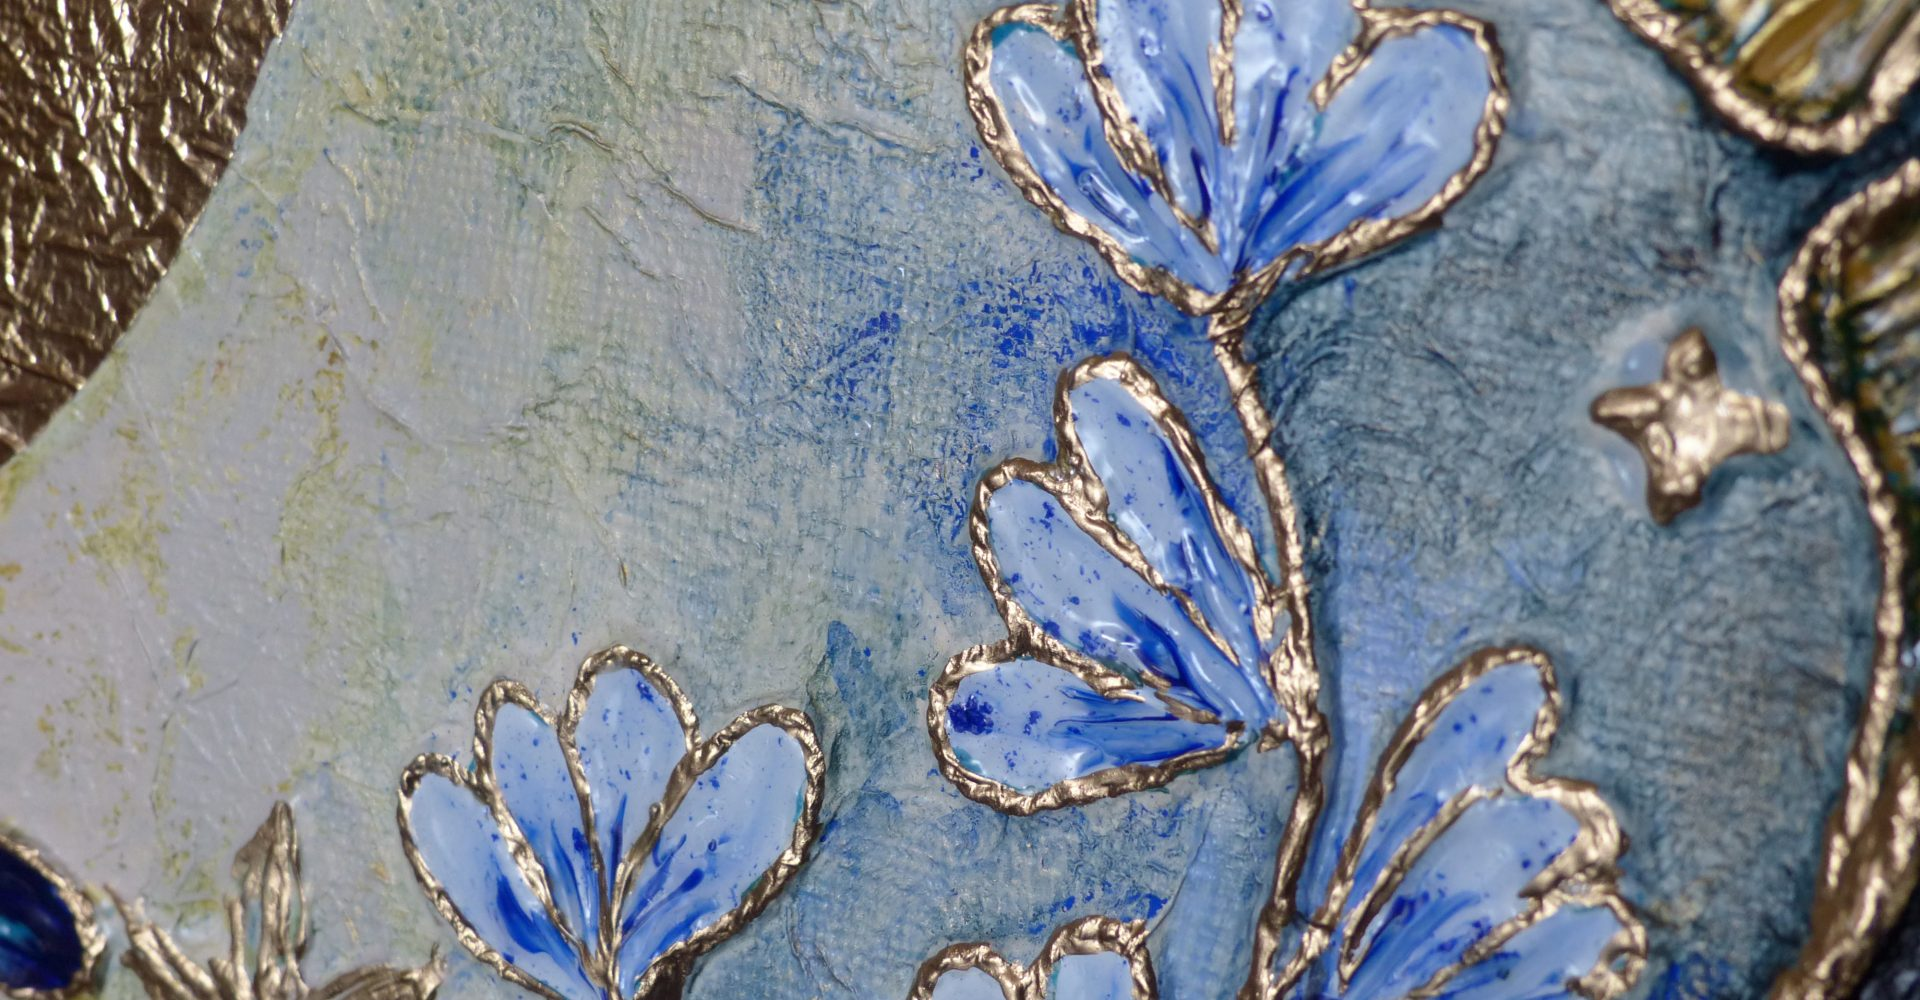 light-blue-flowers-radiance-2020-tiphanie-canada-artiste-peintre-pays-basque